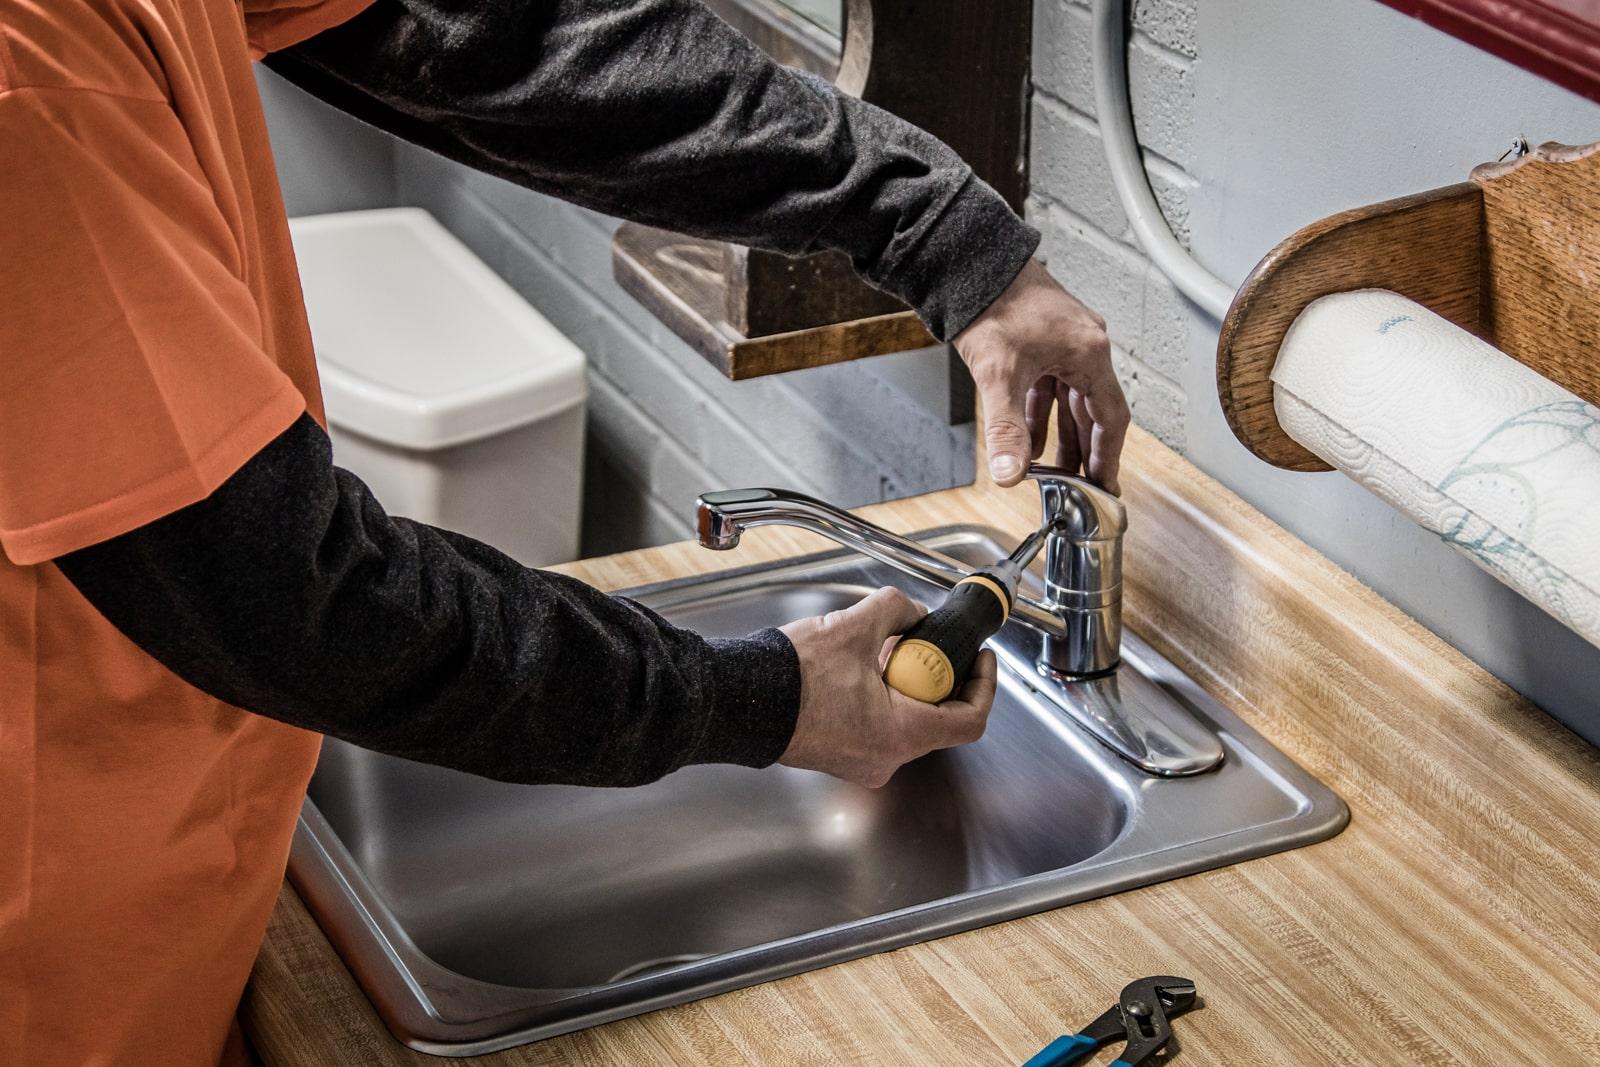 50-Plumbing-John Haughey & Sons Plumbing-77 Design Co-WEB-min